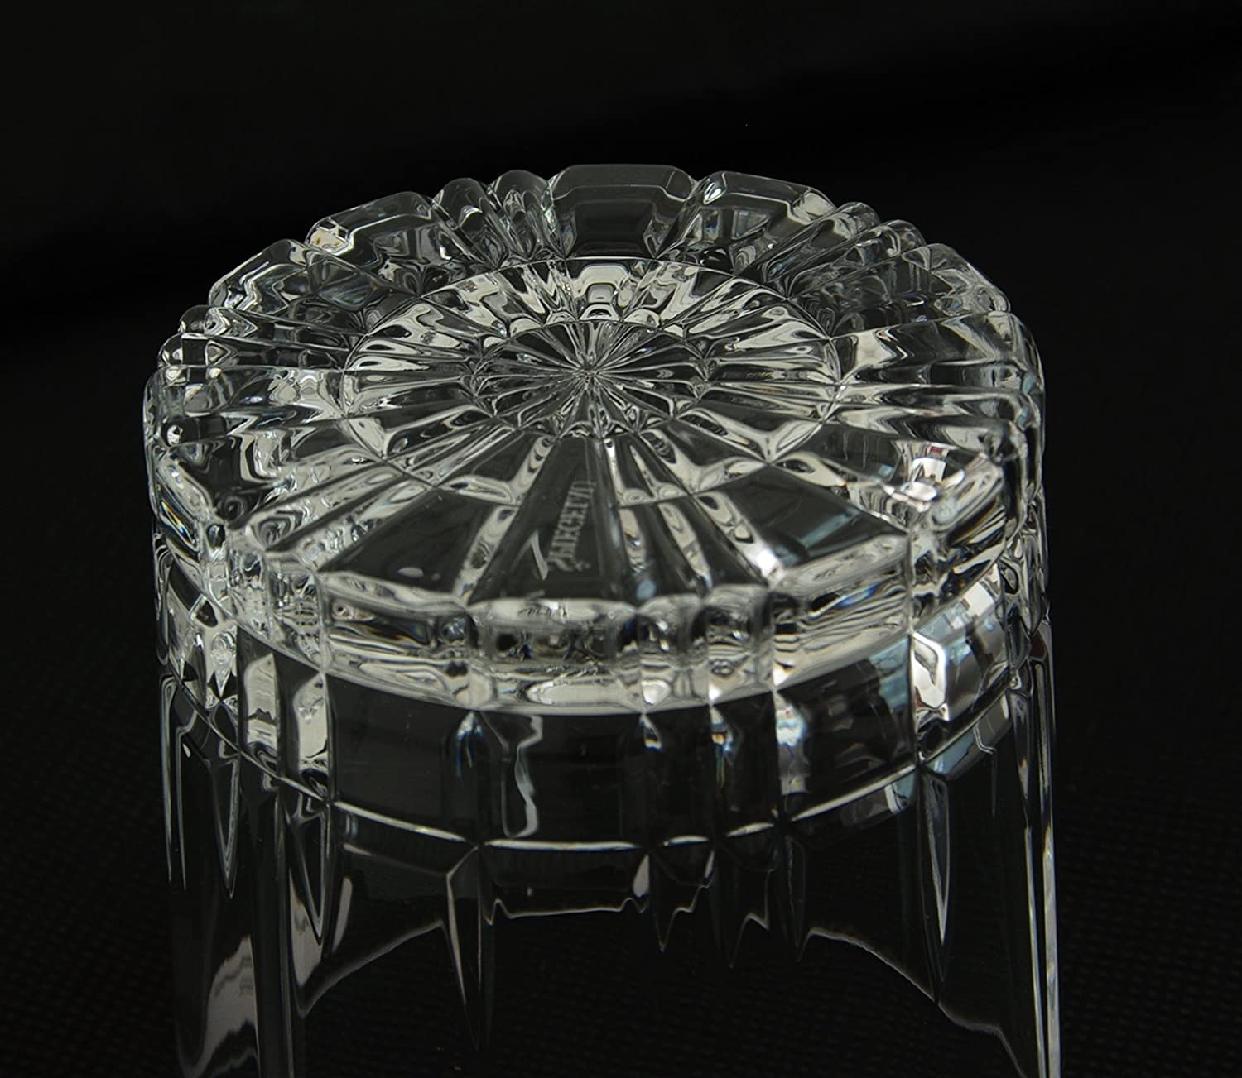 ADERIA(アデリア) ロックグラス クリア 270ml J-4064の商品画像2